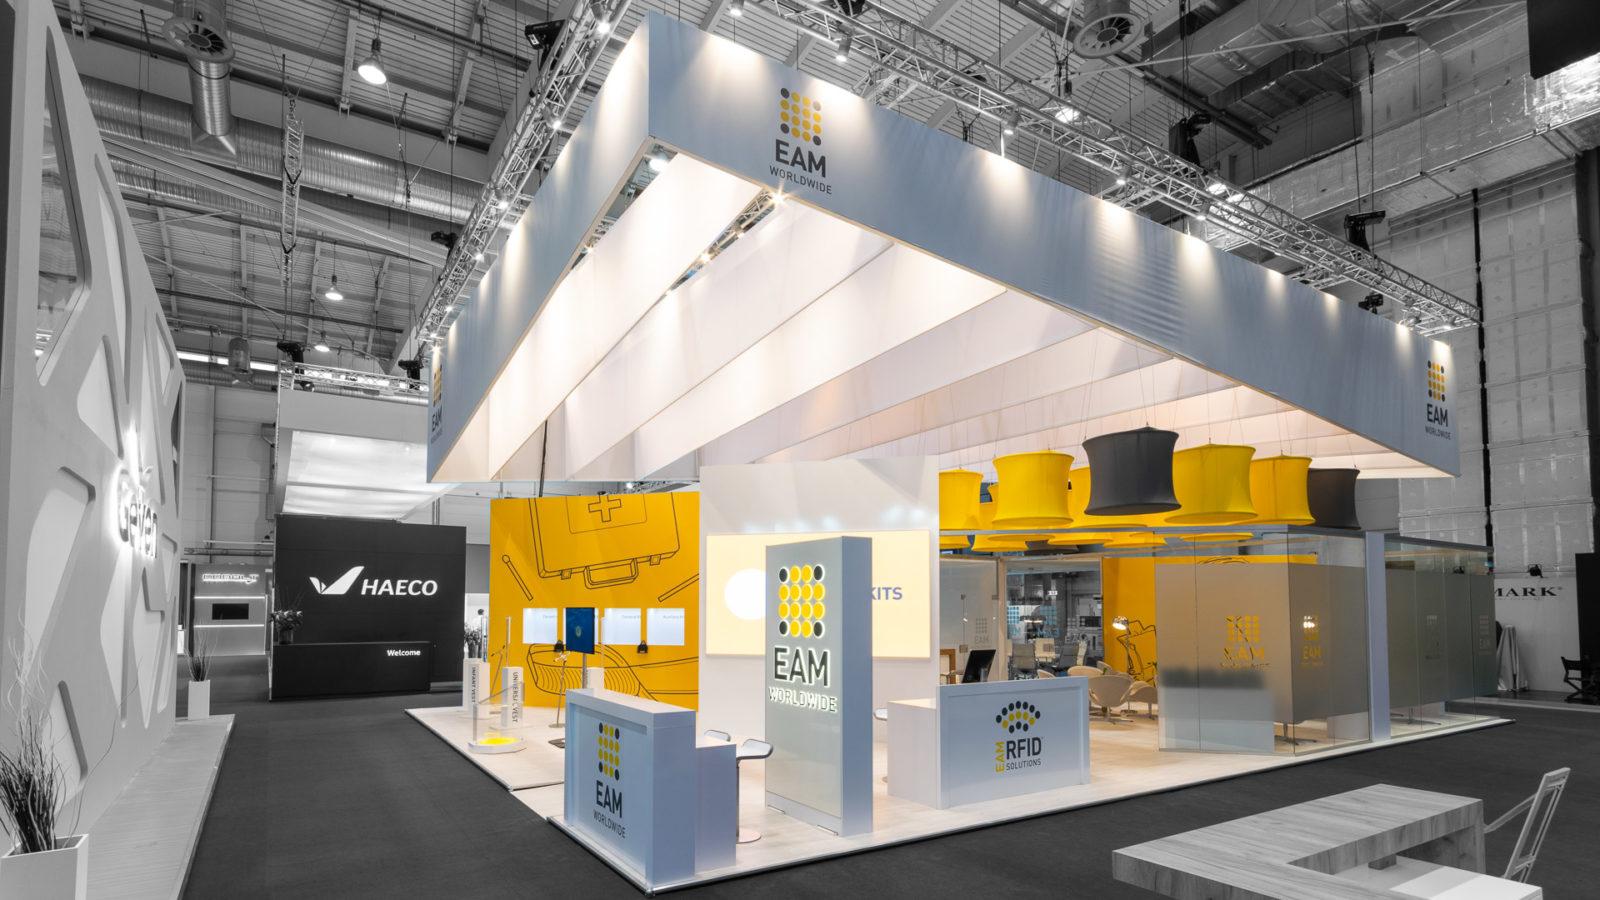 EAM<br>180 m²<br>Aircraft Interiors Expo